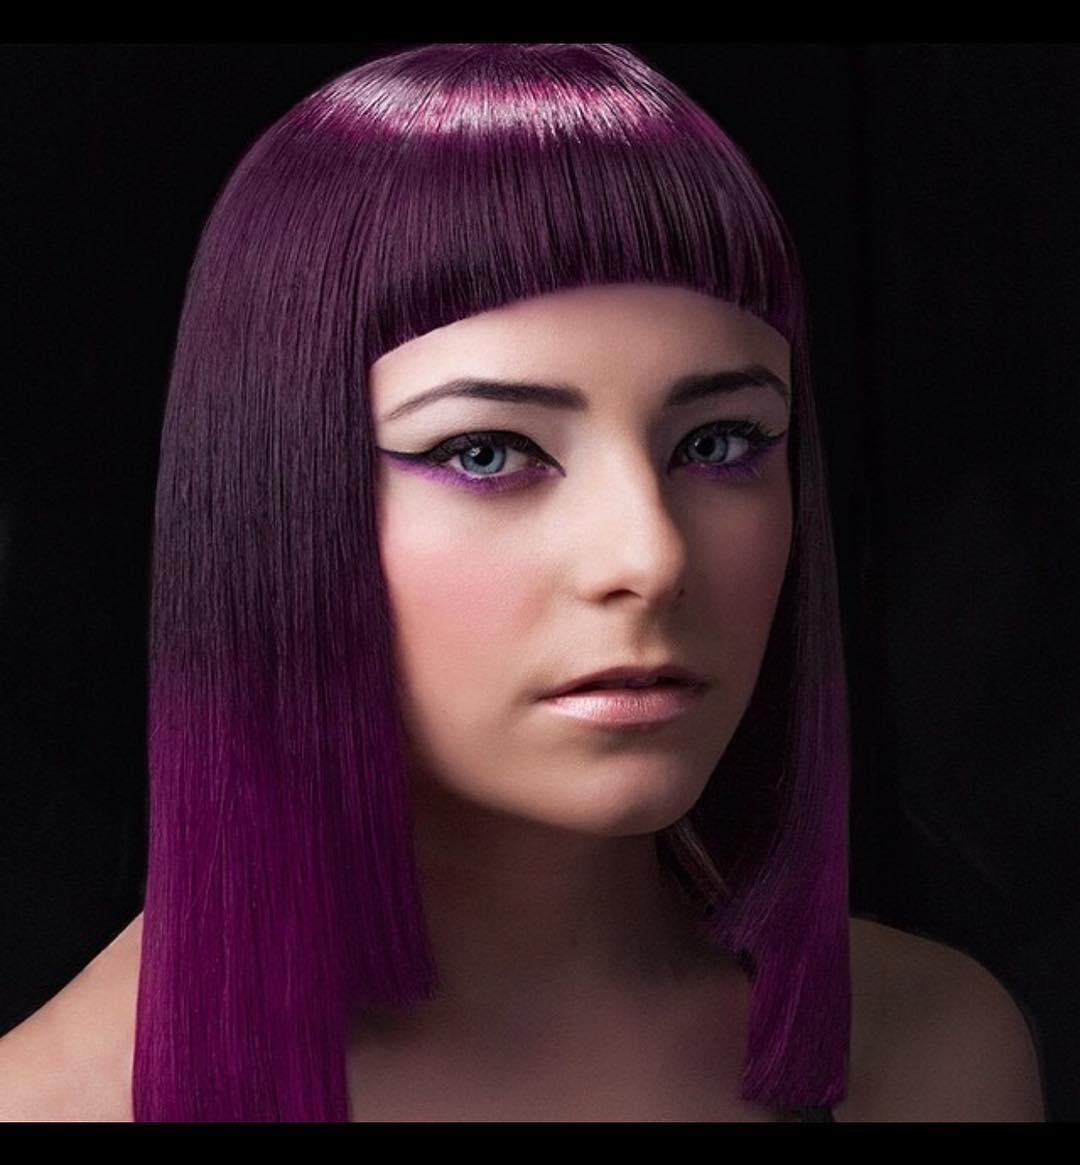 myhairgurupaisley olaplexuk olaplex purplehairlaquersprismisbob bobhaircut hairdresserhairdresserpaisley paisley glasgowhairdresser glasgow donnagunn01